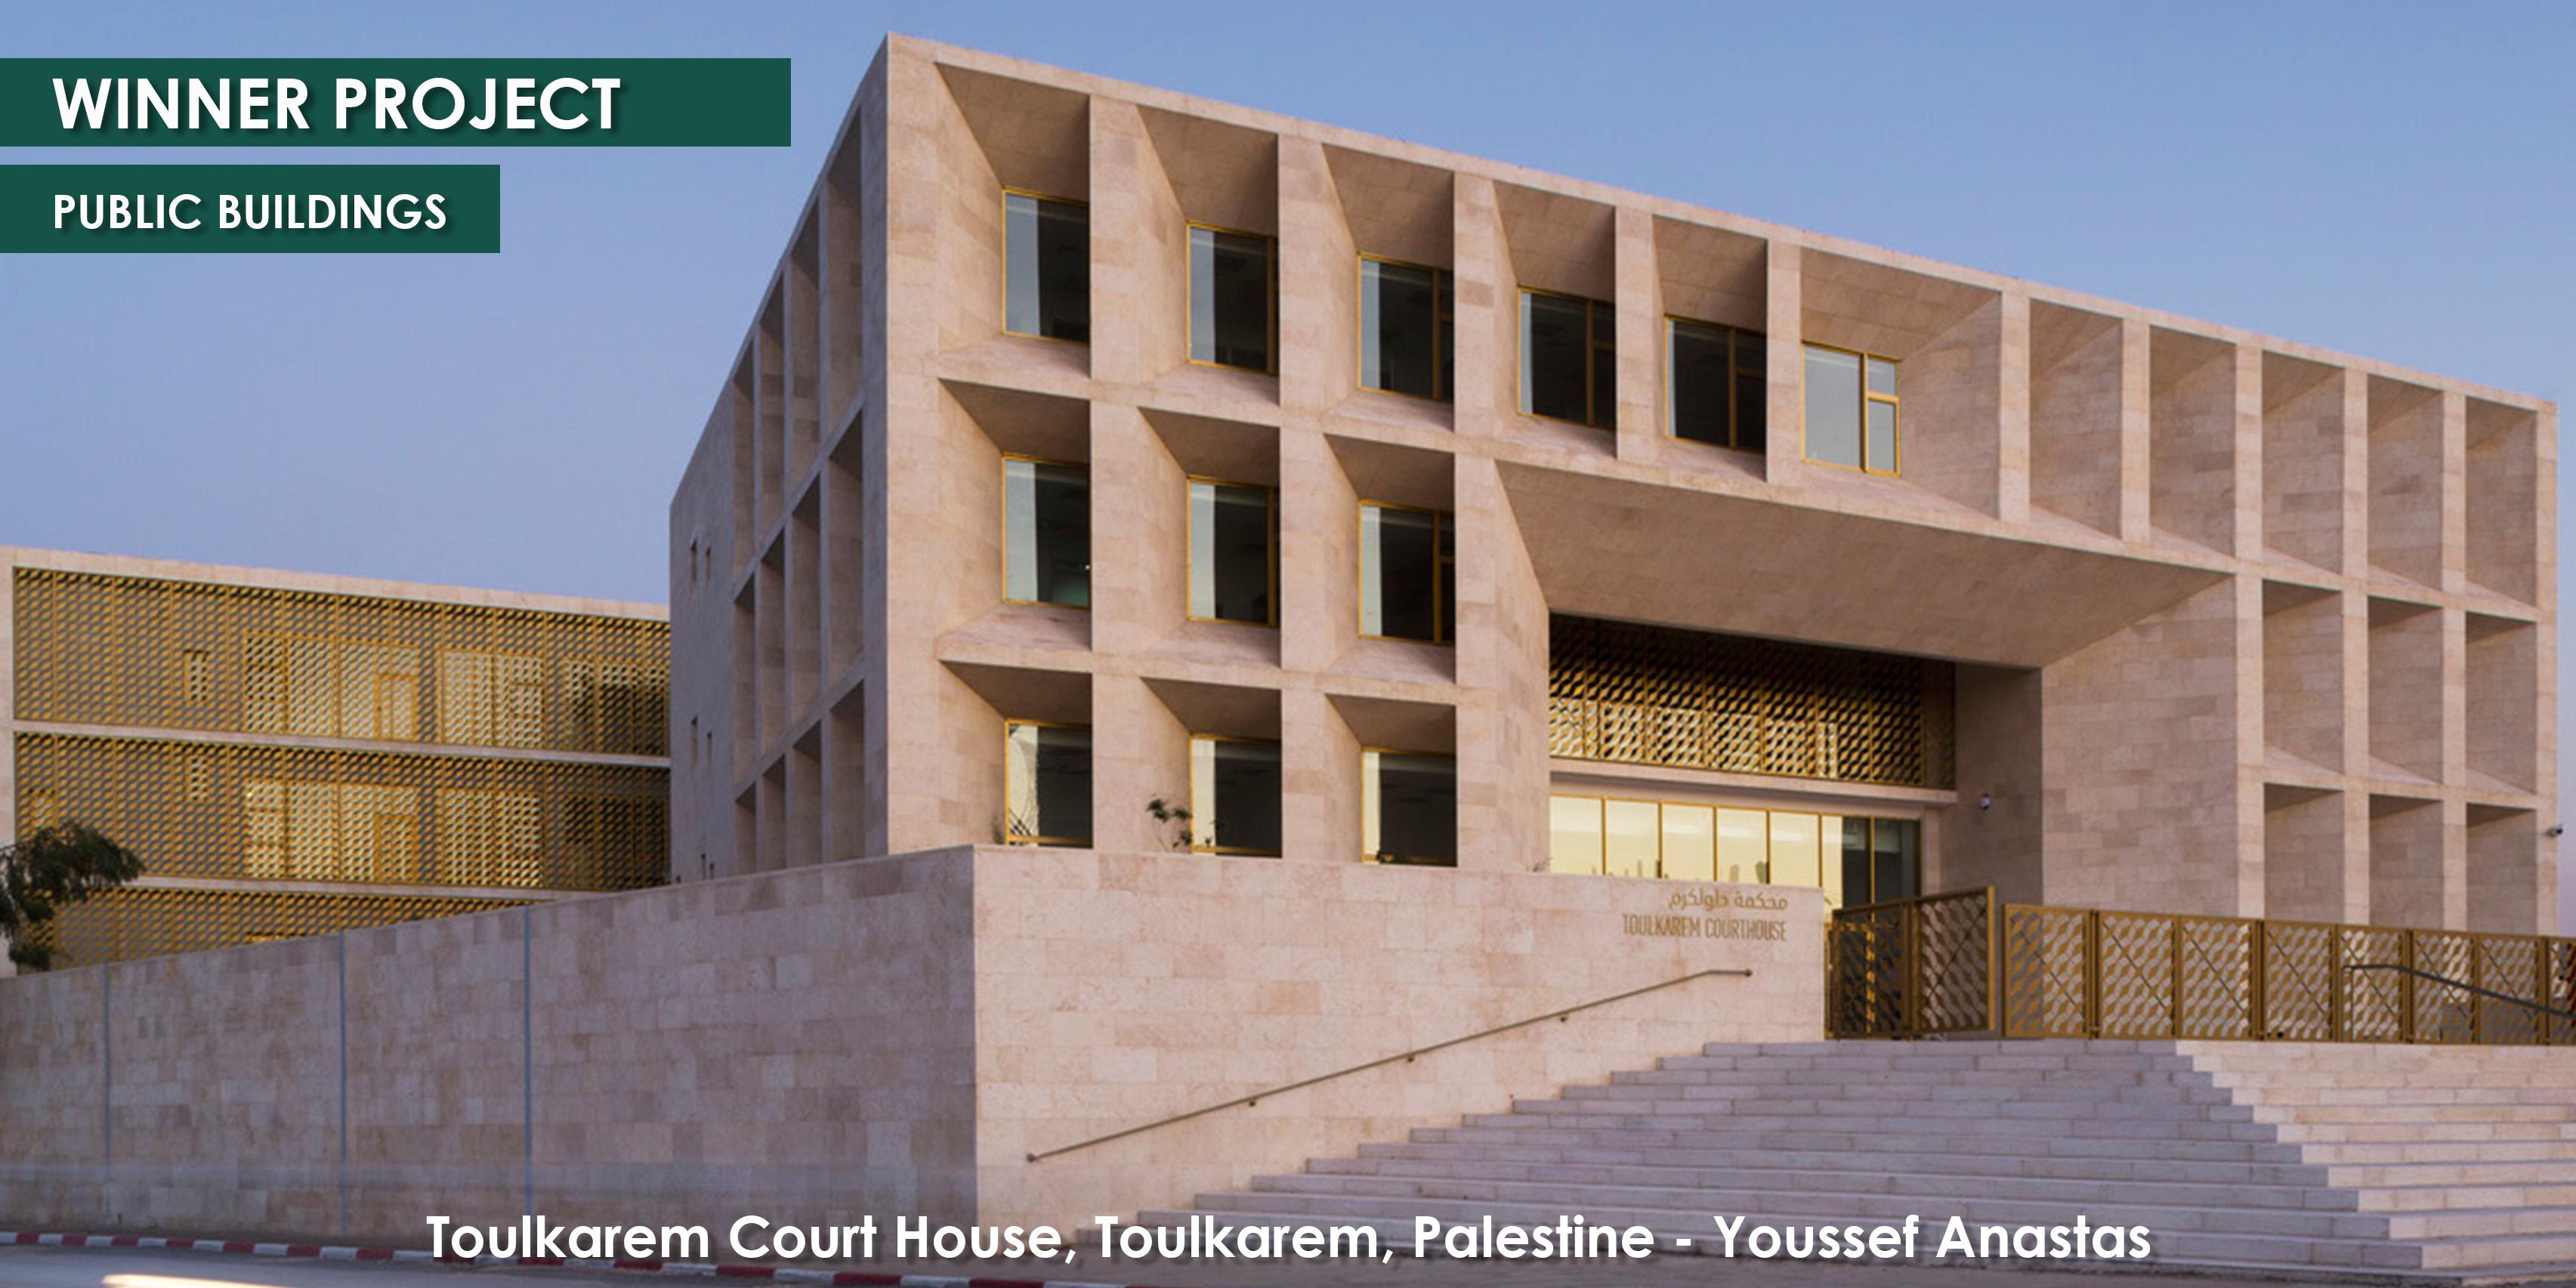 Moderating the Arab Architects Award